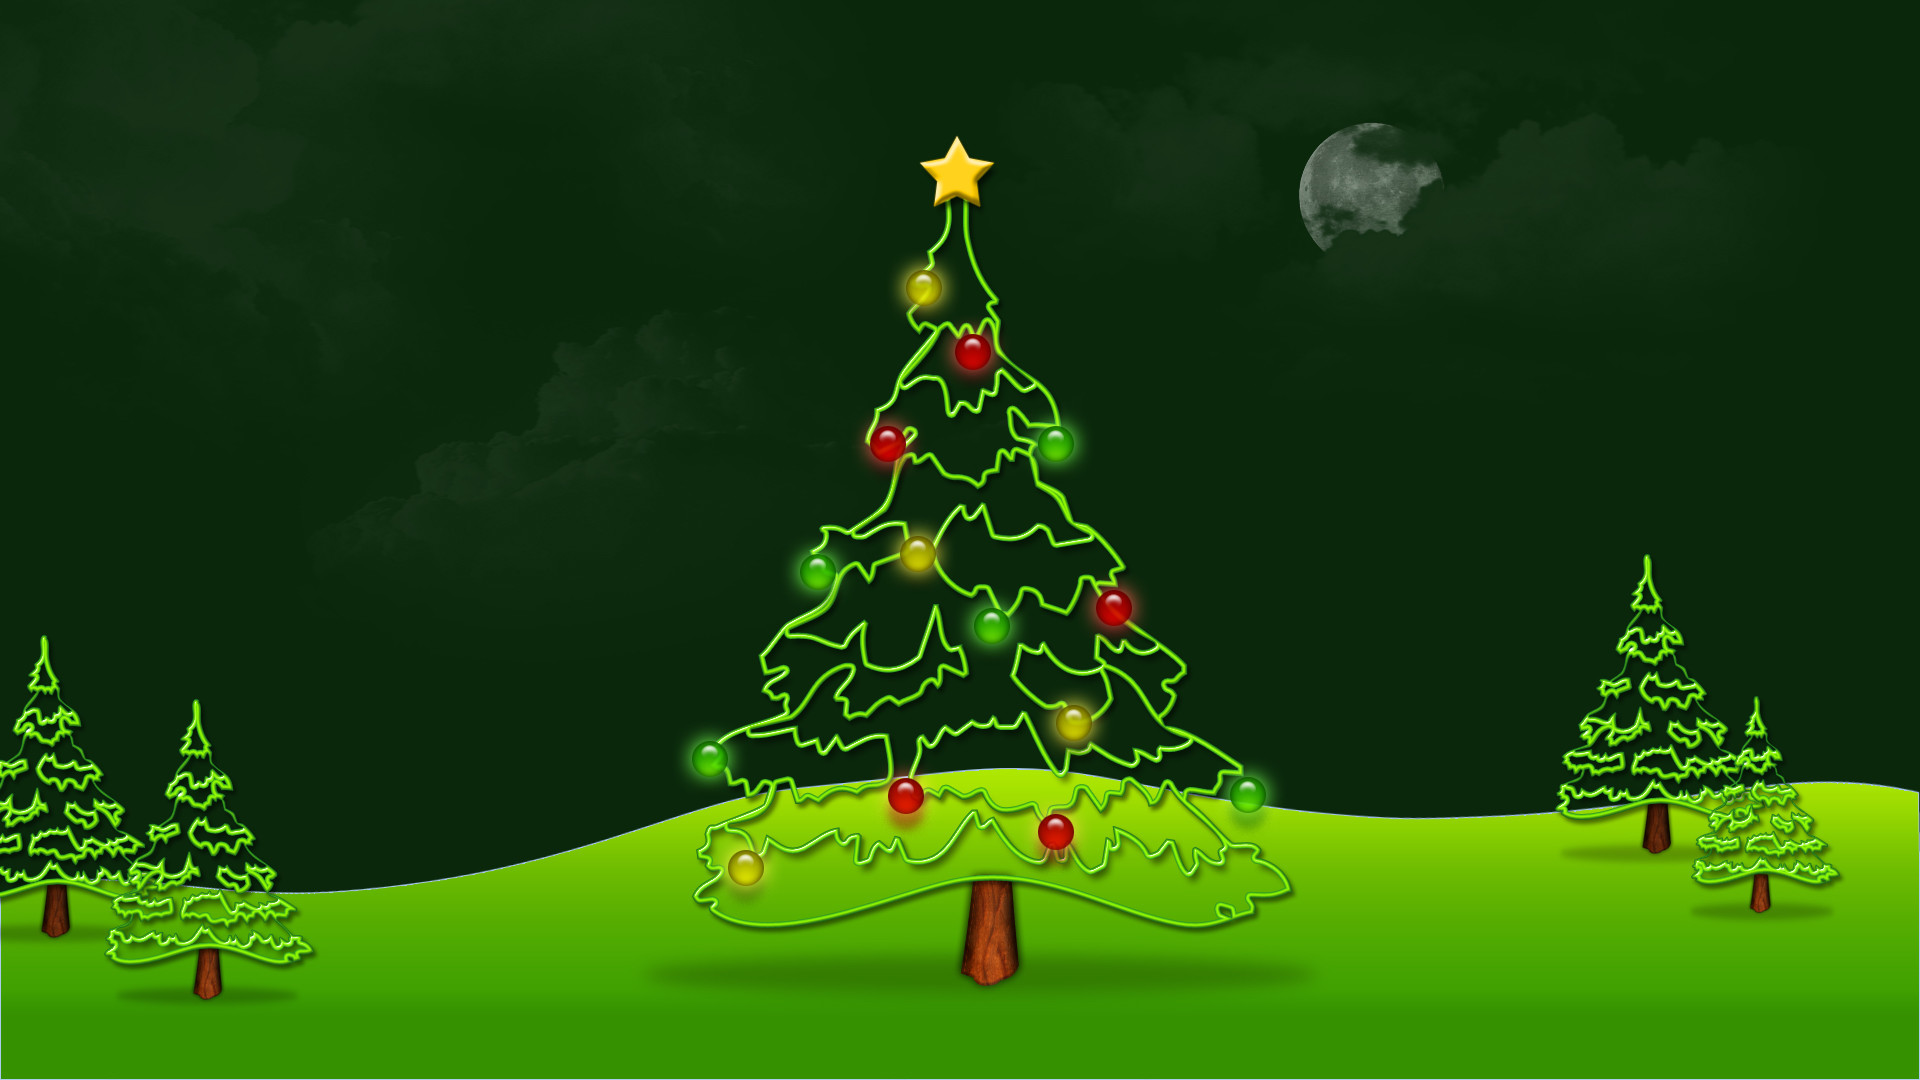 Christmas Hd Wallpaper 1080p 1920x1080 72 Images